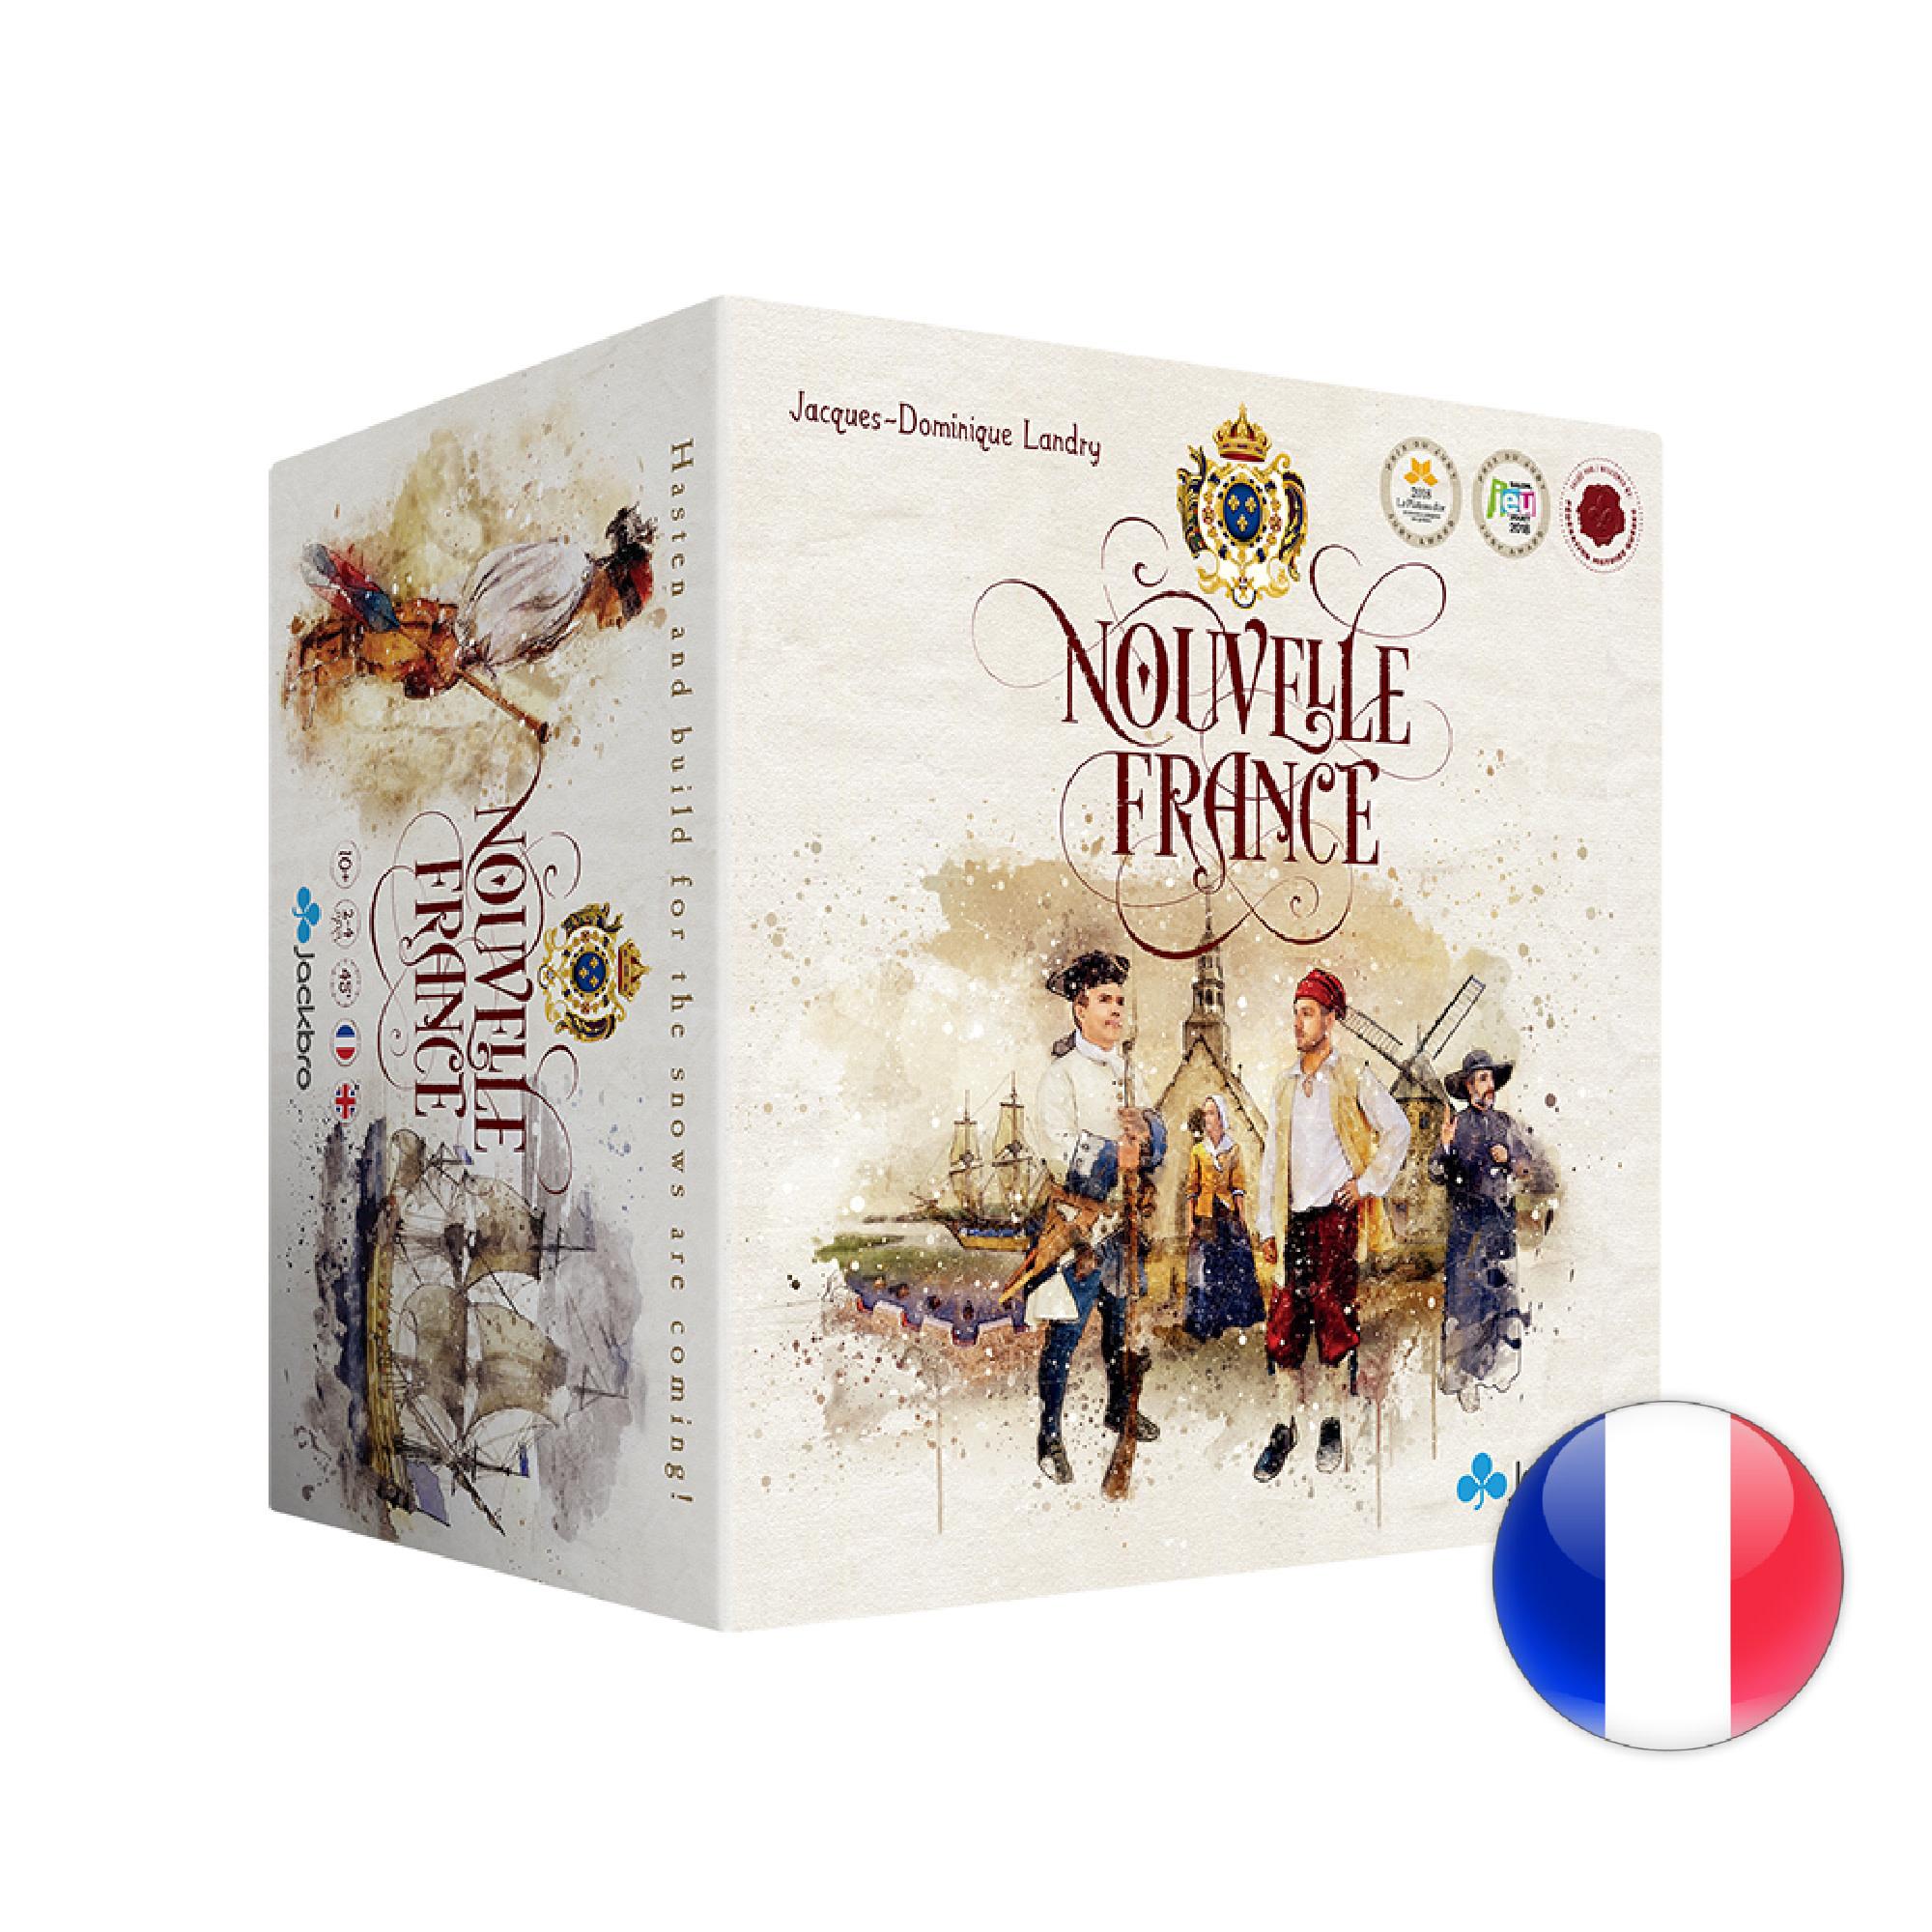 Jackbro Nouvelle France